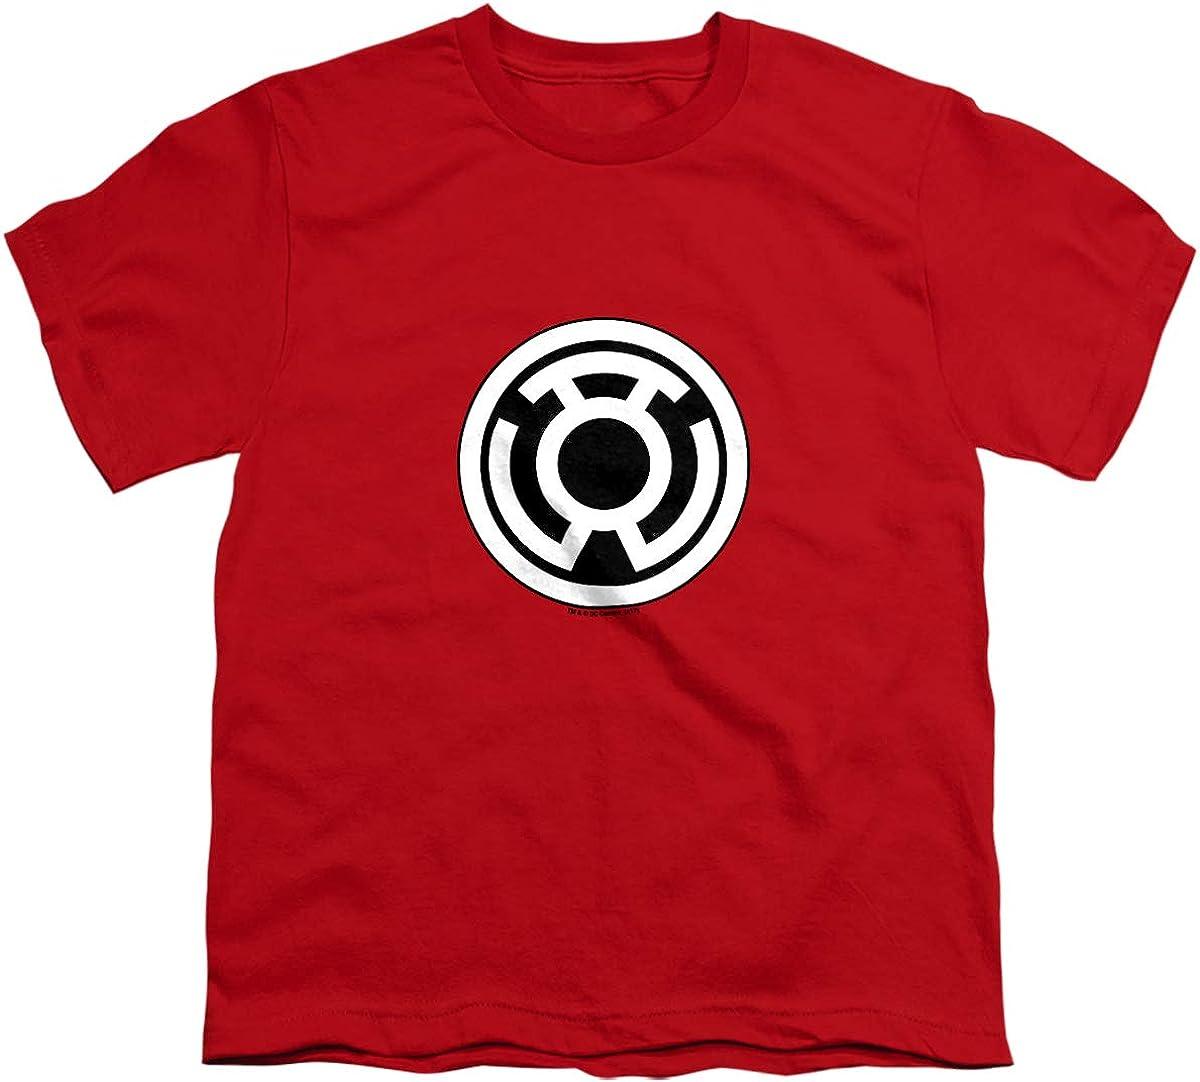 Green Lantern Sinestro Corps Logo Unisex Youth T Shirt, Red, X-Large